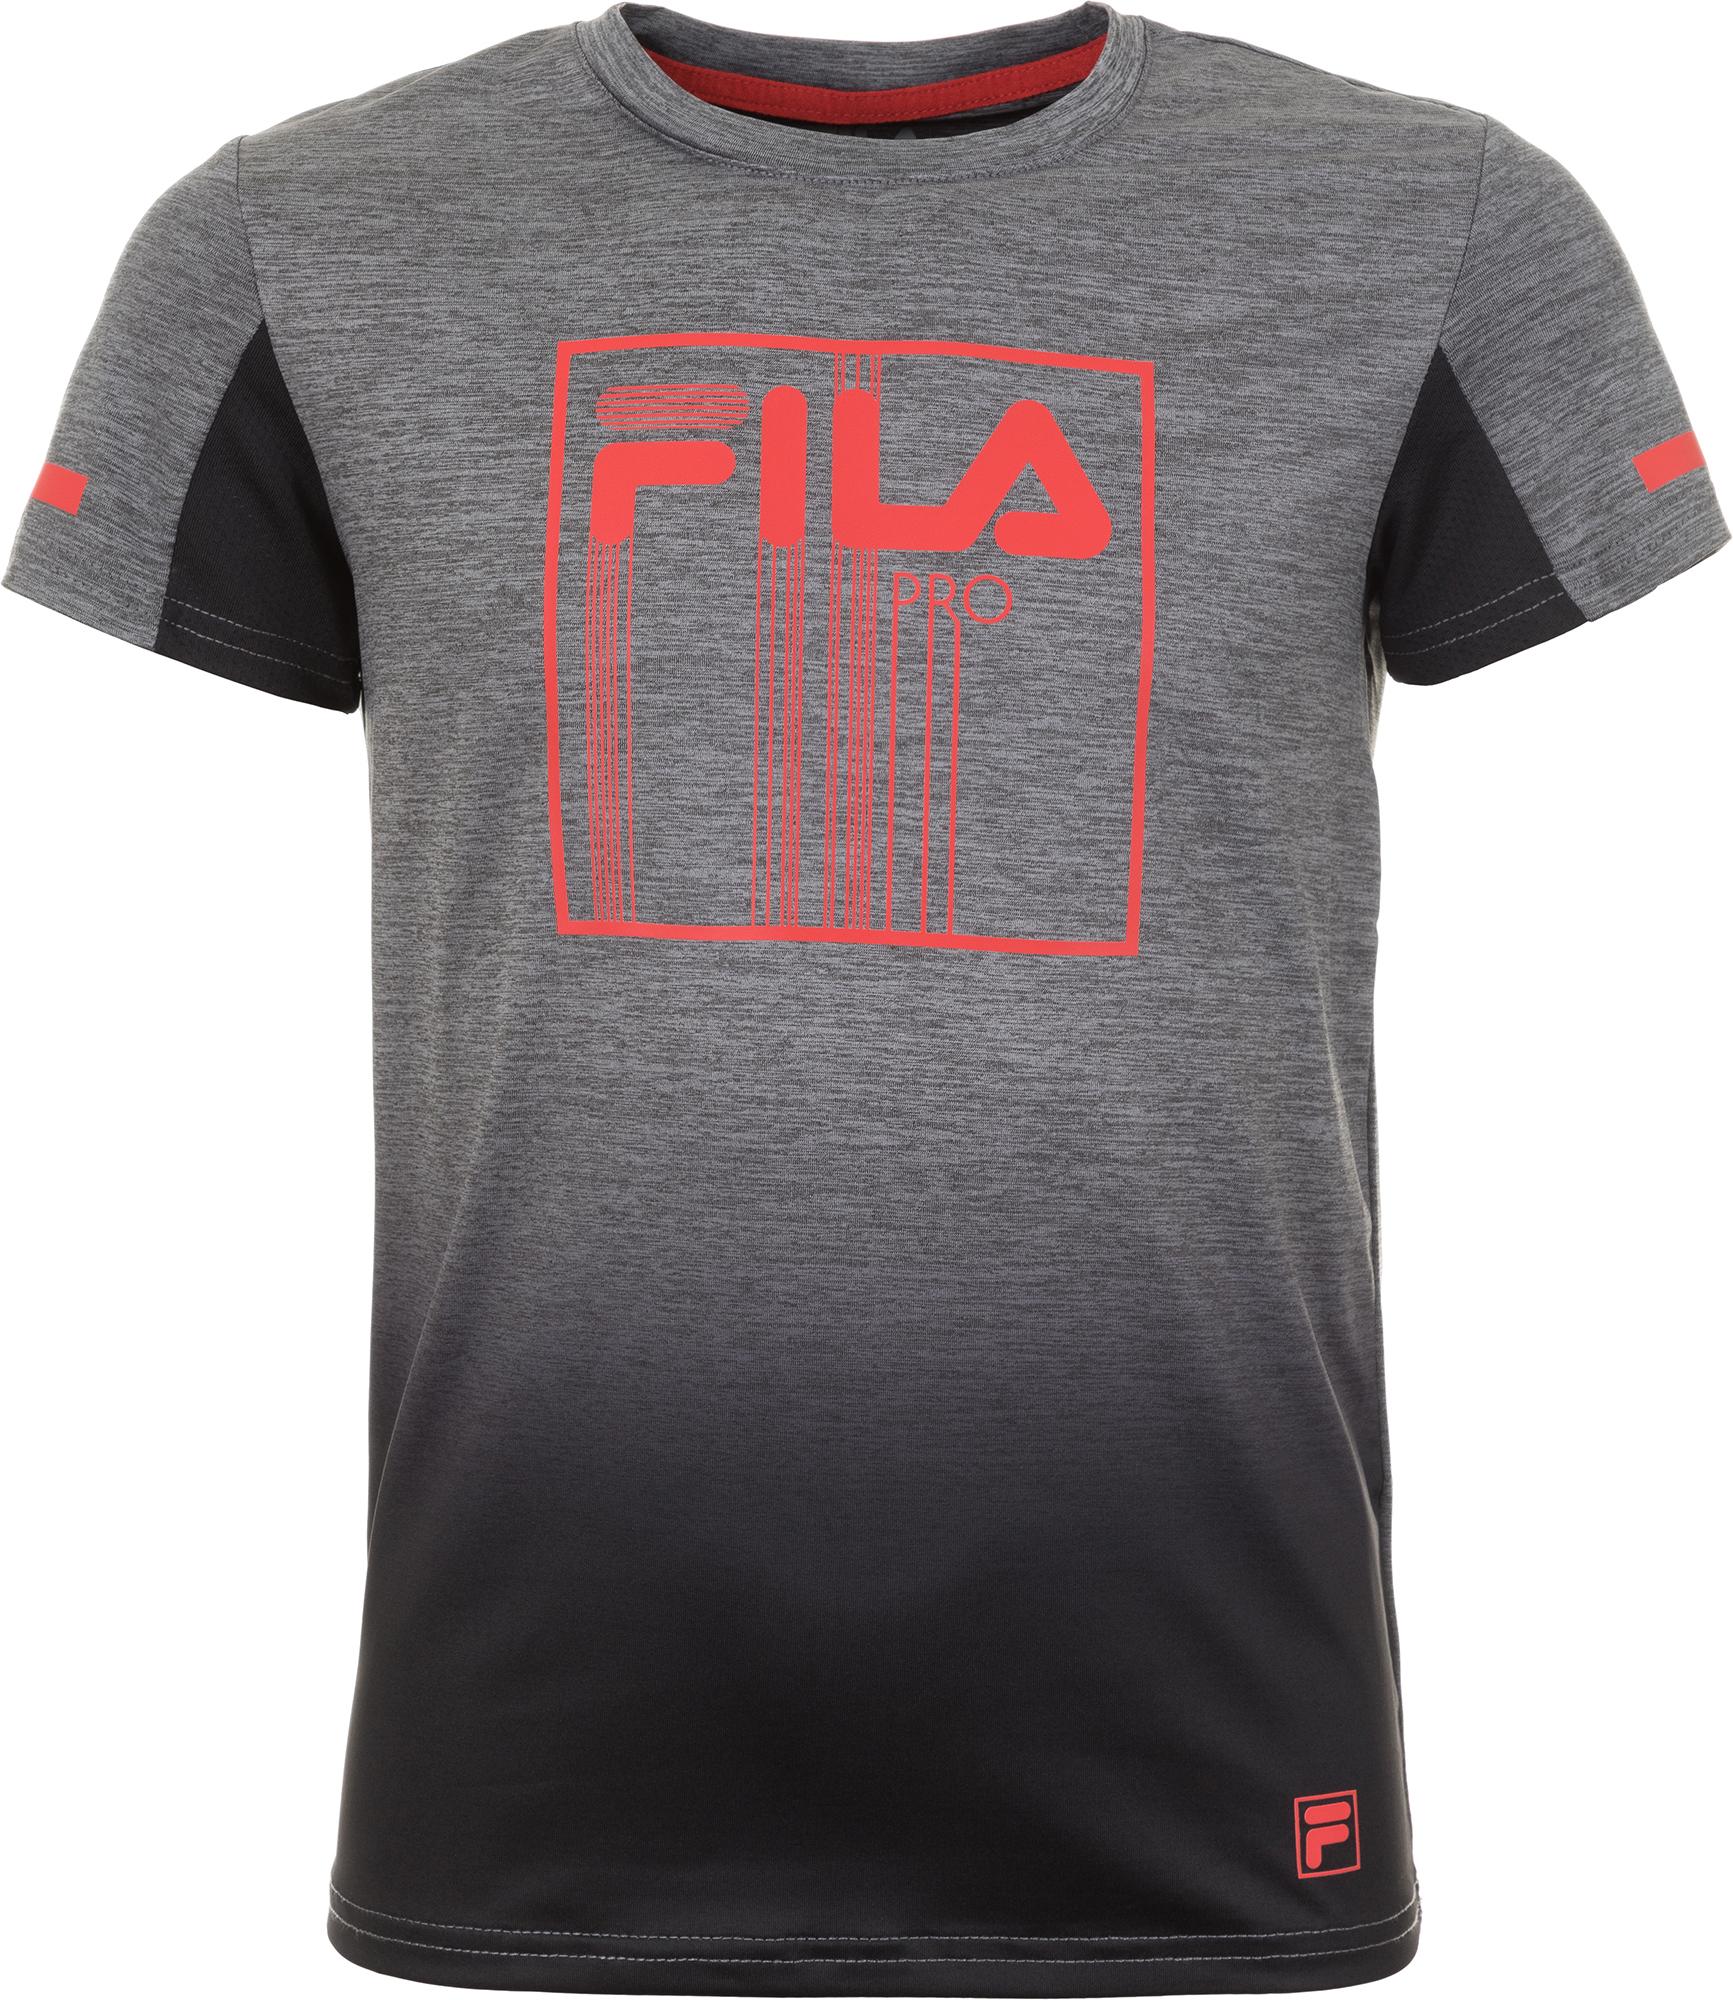 Fila Футболка для мальчиков Fila, размер 134 рюкзак fila f3bpx007 2014